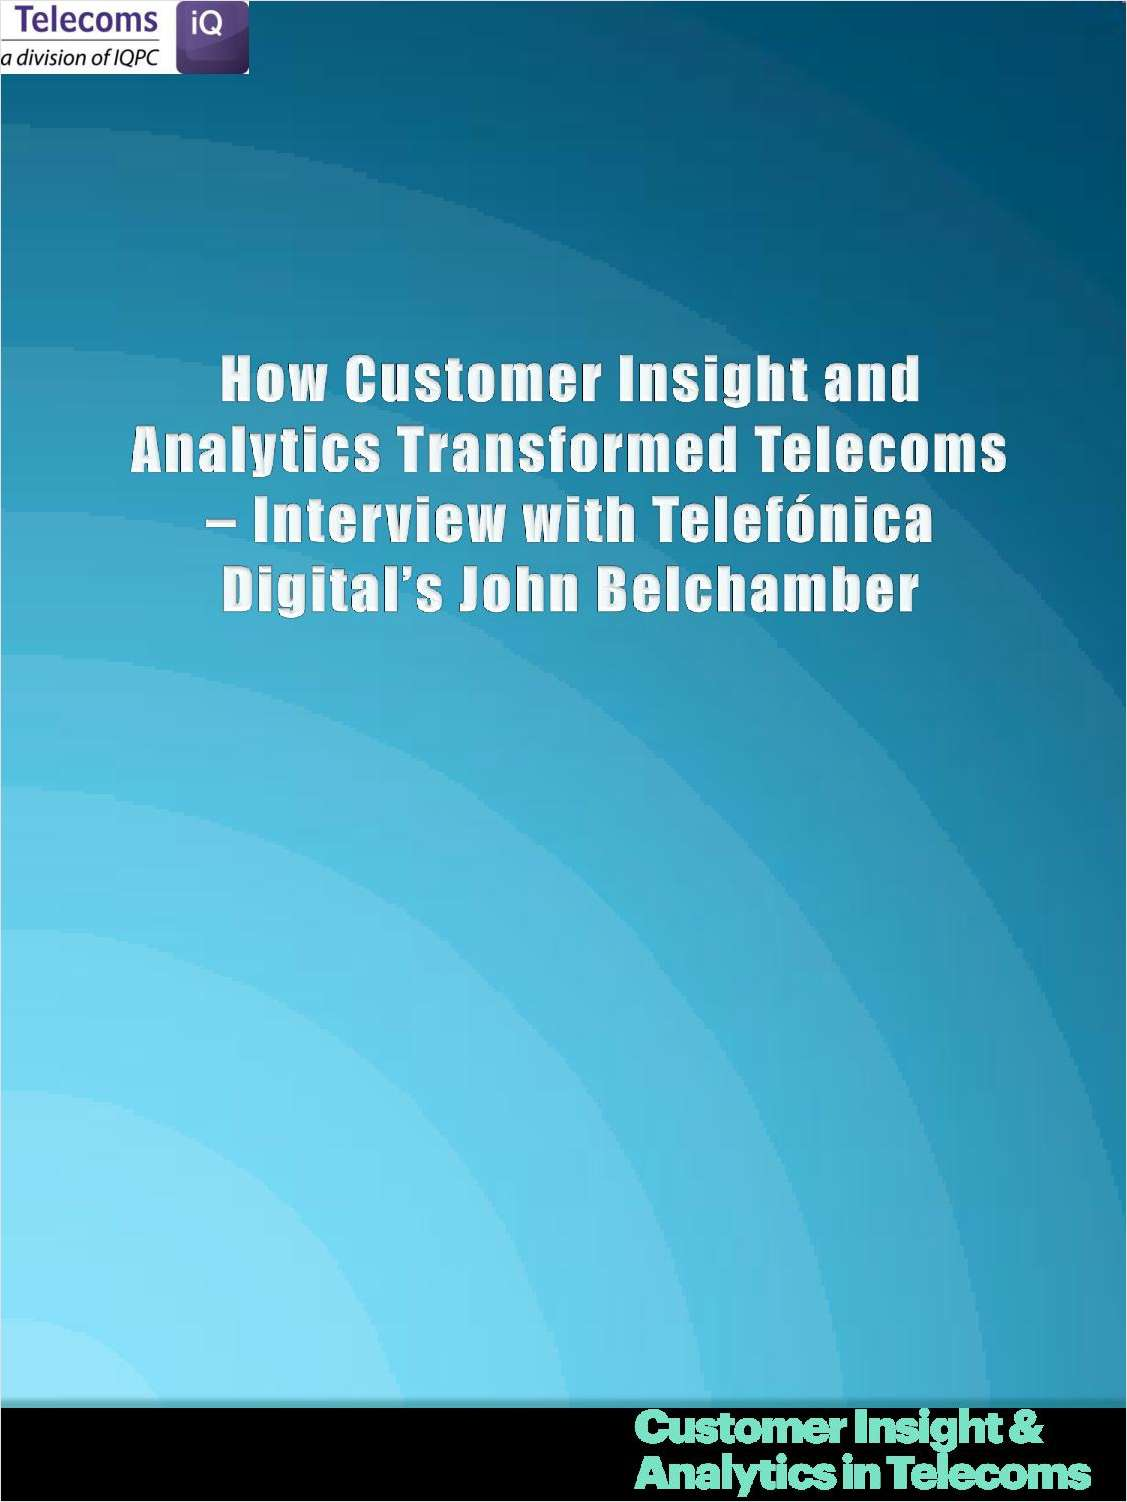 How Customer Insight and Analytics Has Transformed Telecoms